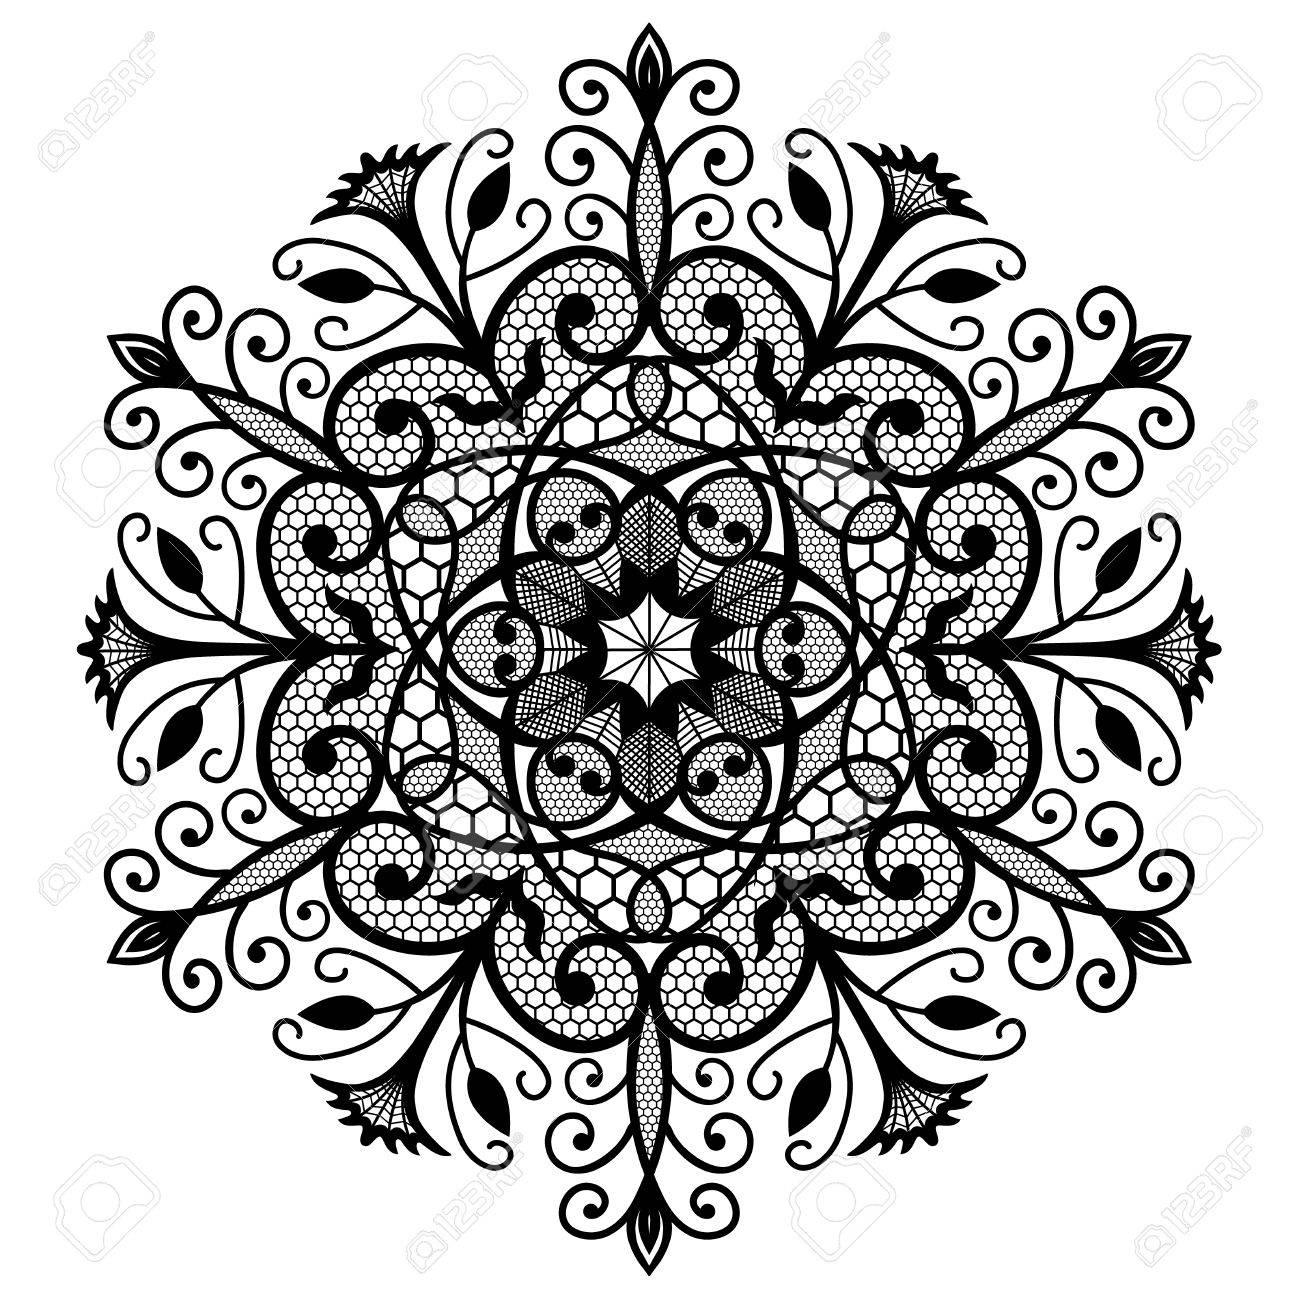 Decorative Lace Round Ornament Intricate Flower Pattern Flourish Design Black Weave Emblem On